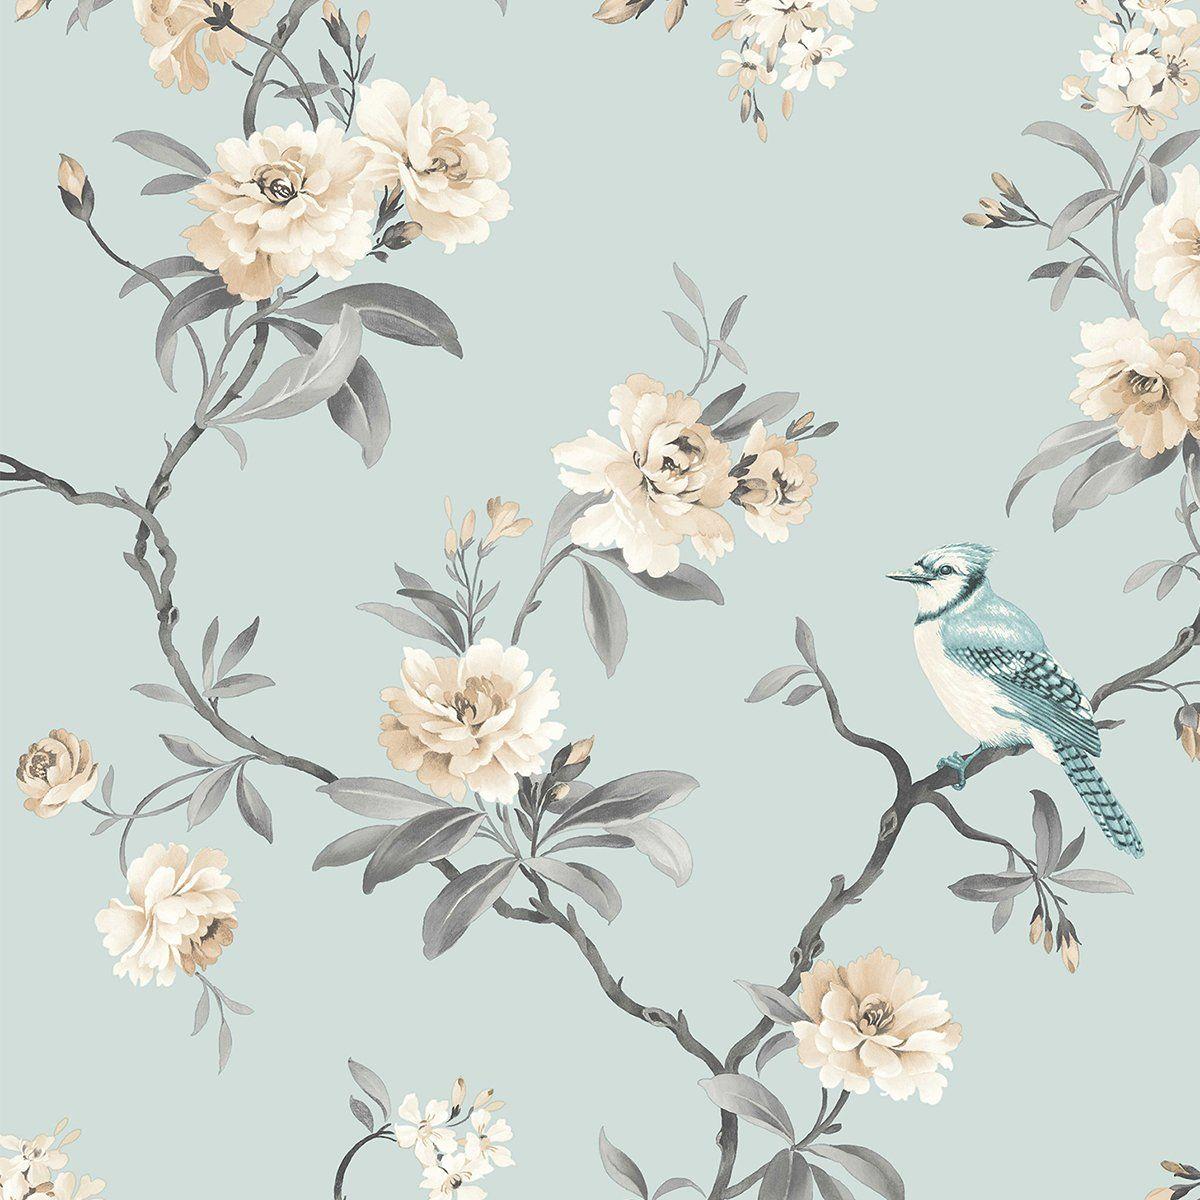 Chinoiserie Blue Floral Wallpaper Blue Floral Wallpaper Floral